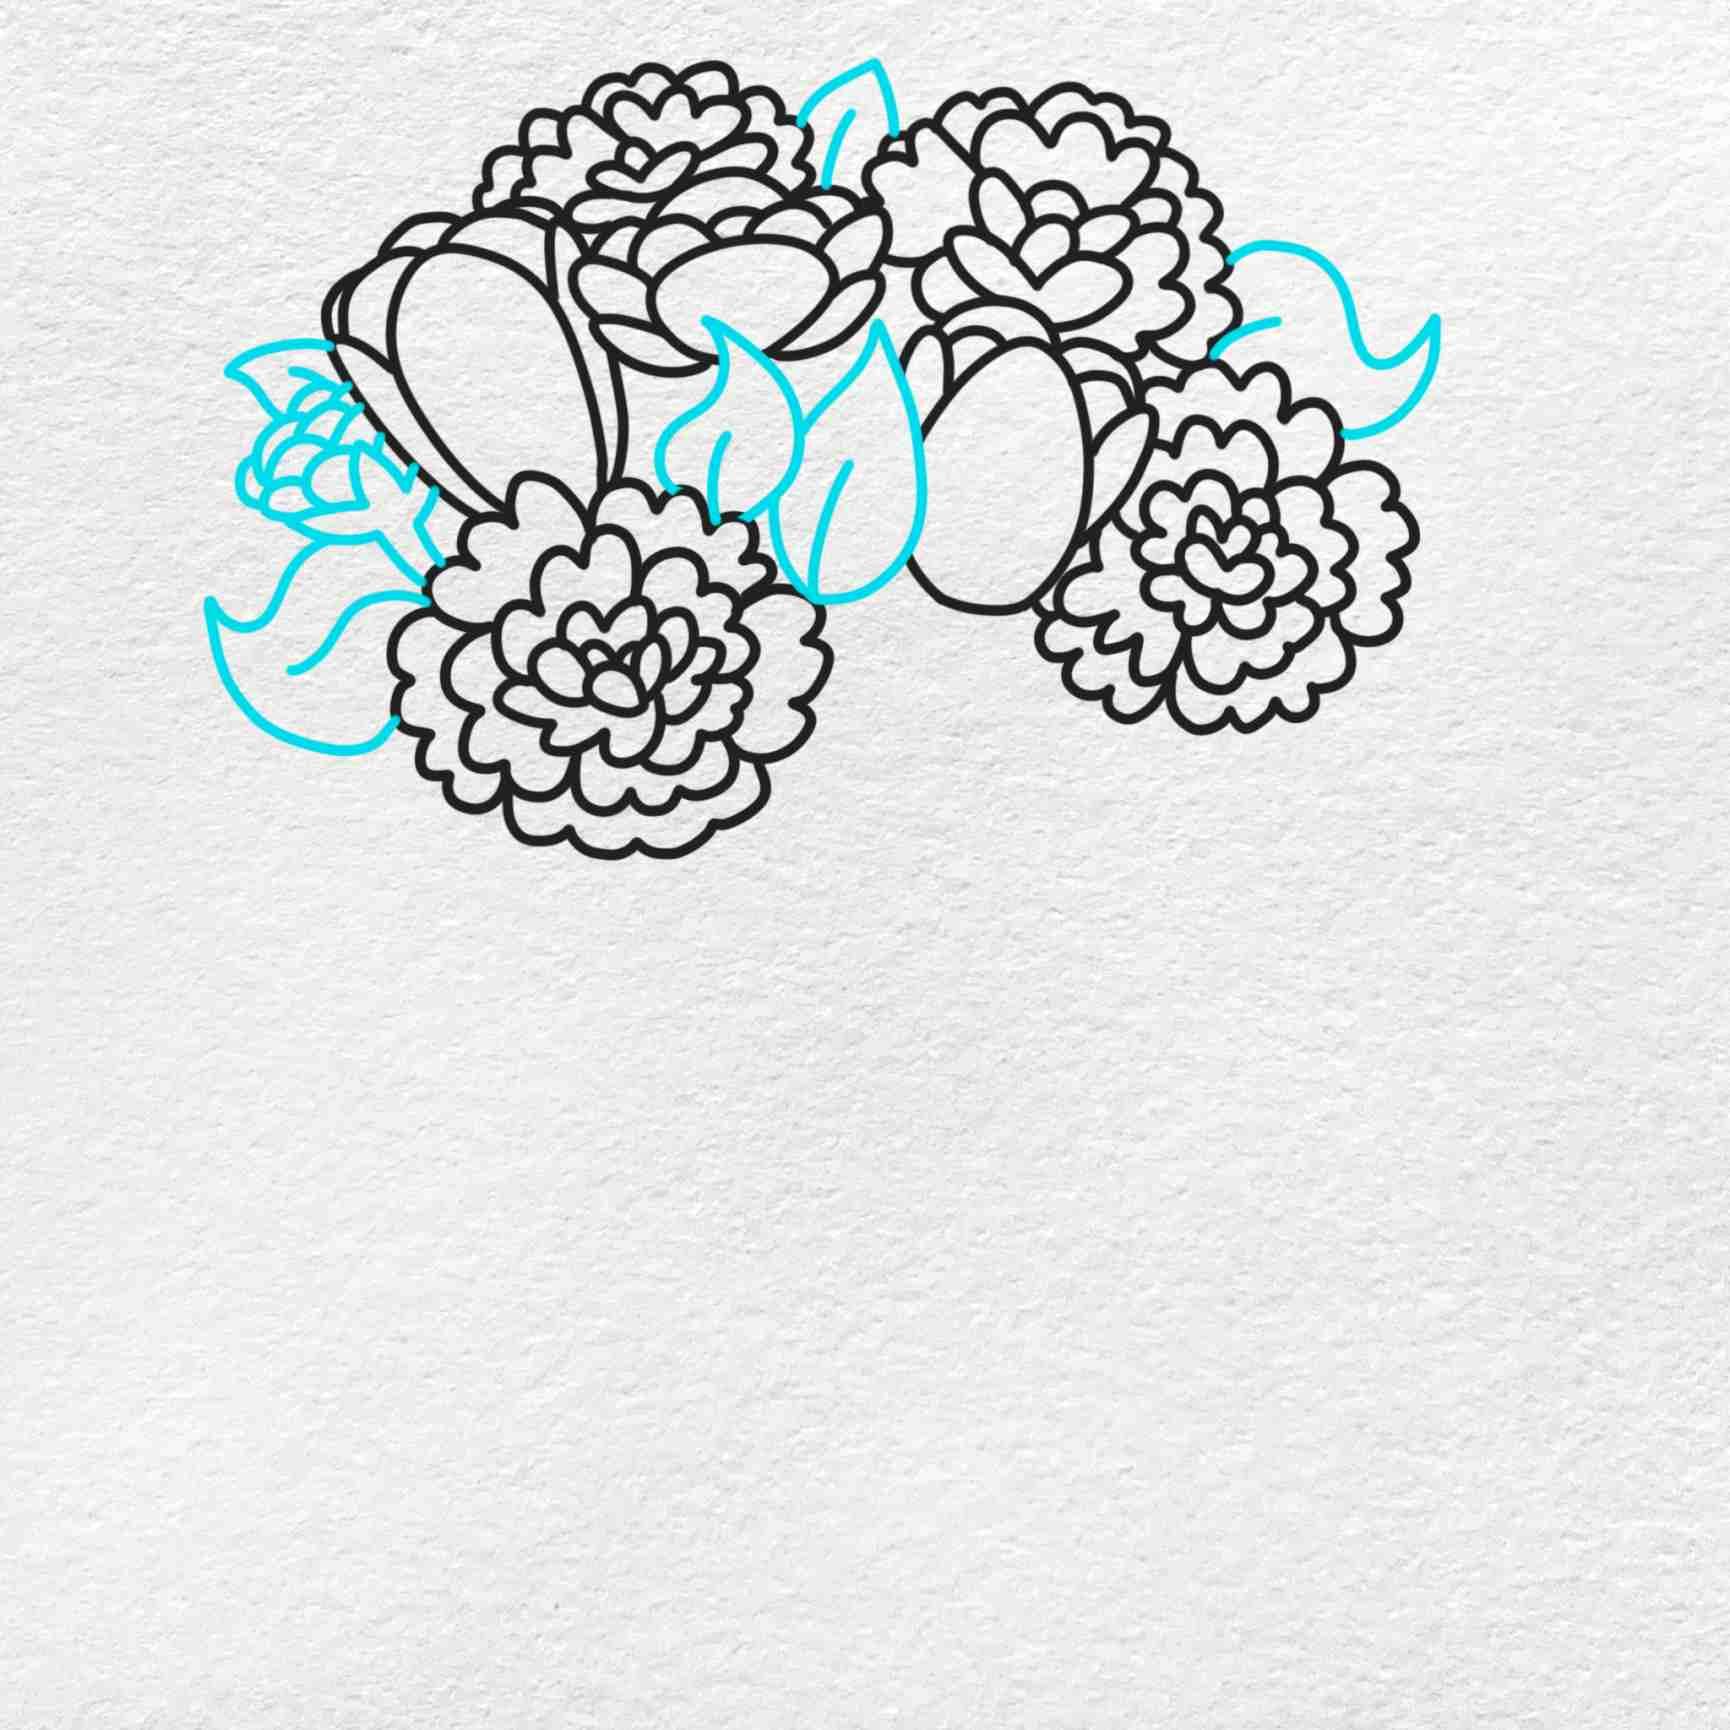 Spring Flowers Drawing: Step 5